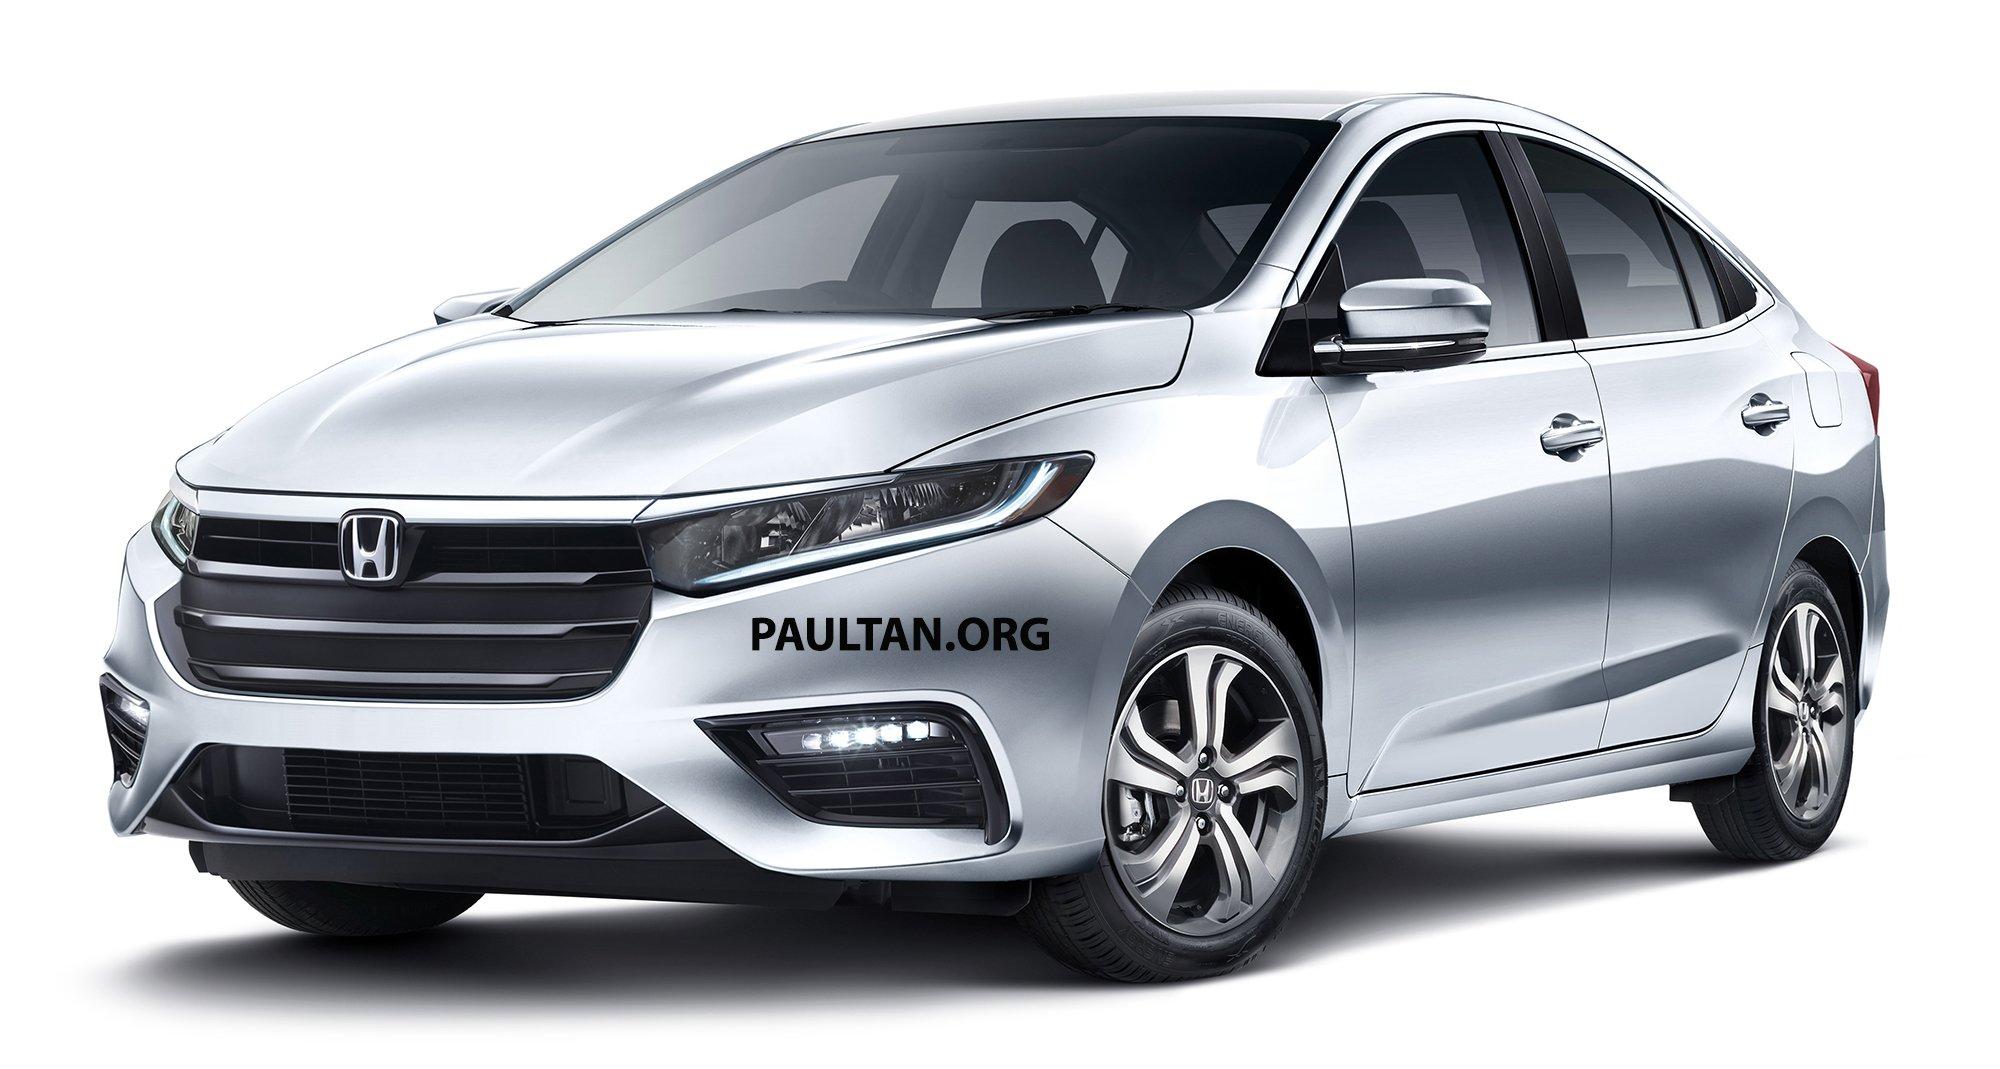 Honda Car Loan Calculator Philippines